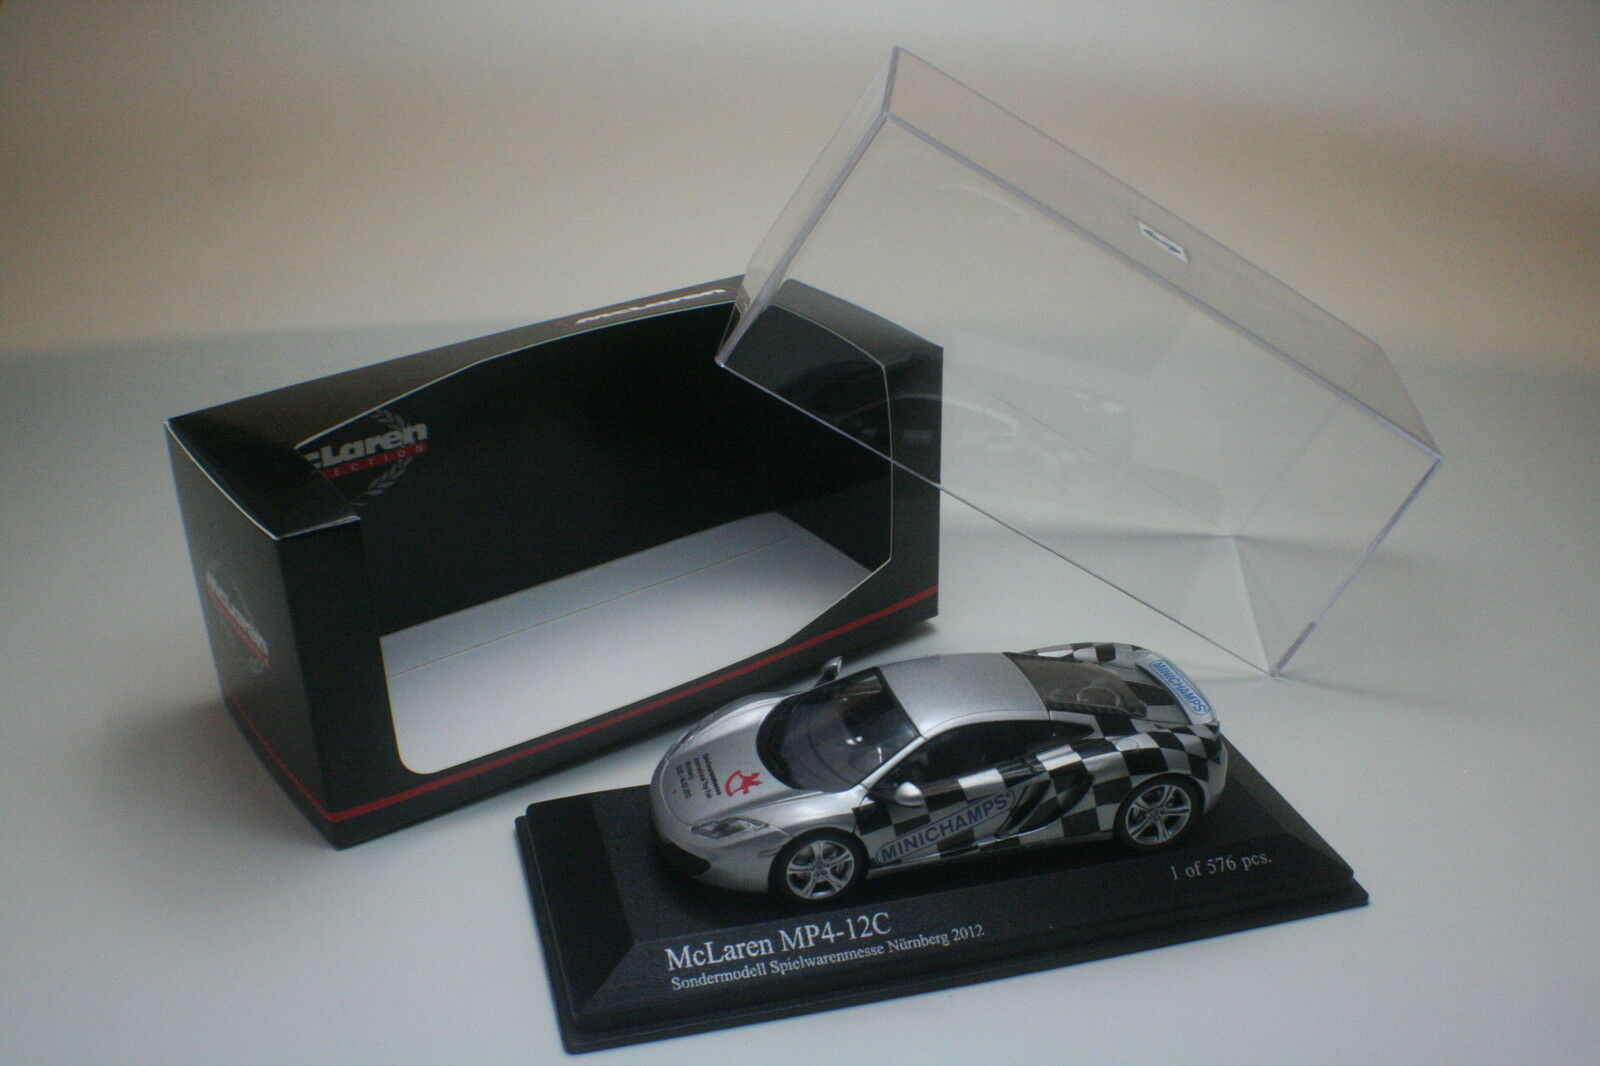 McLaren mp4-12c Toy Fair 2012 Norimberga Minichamps 1 43 NUOVO OVP